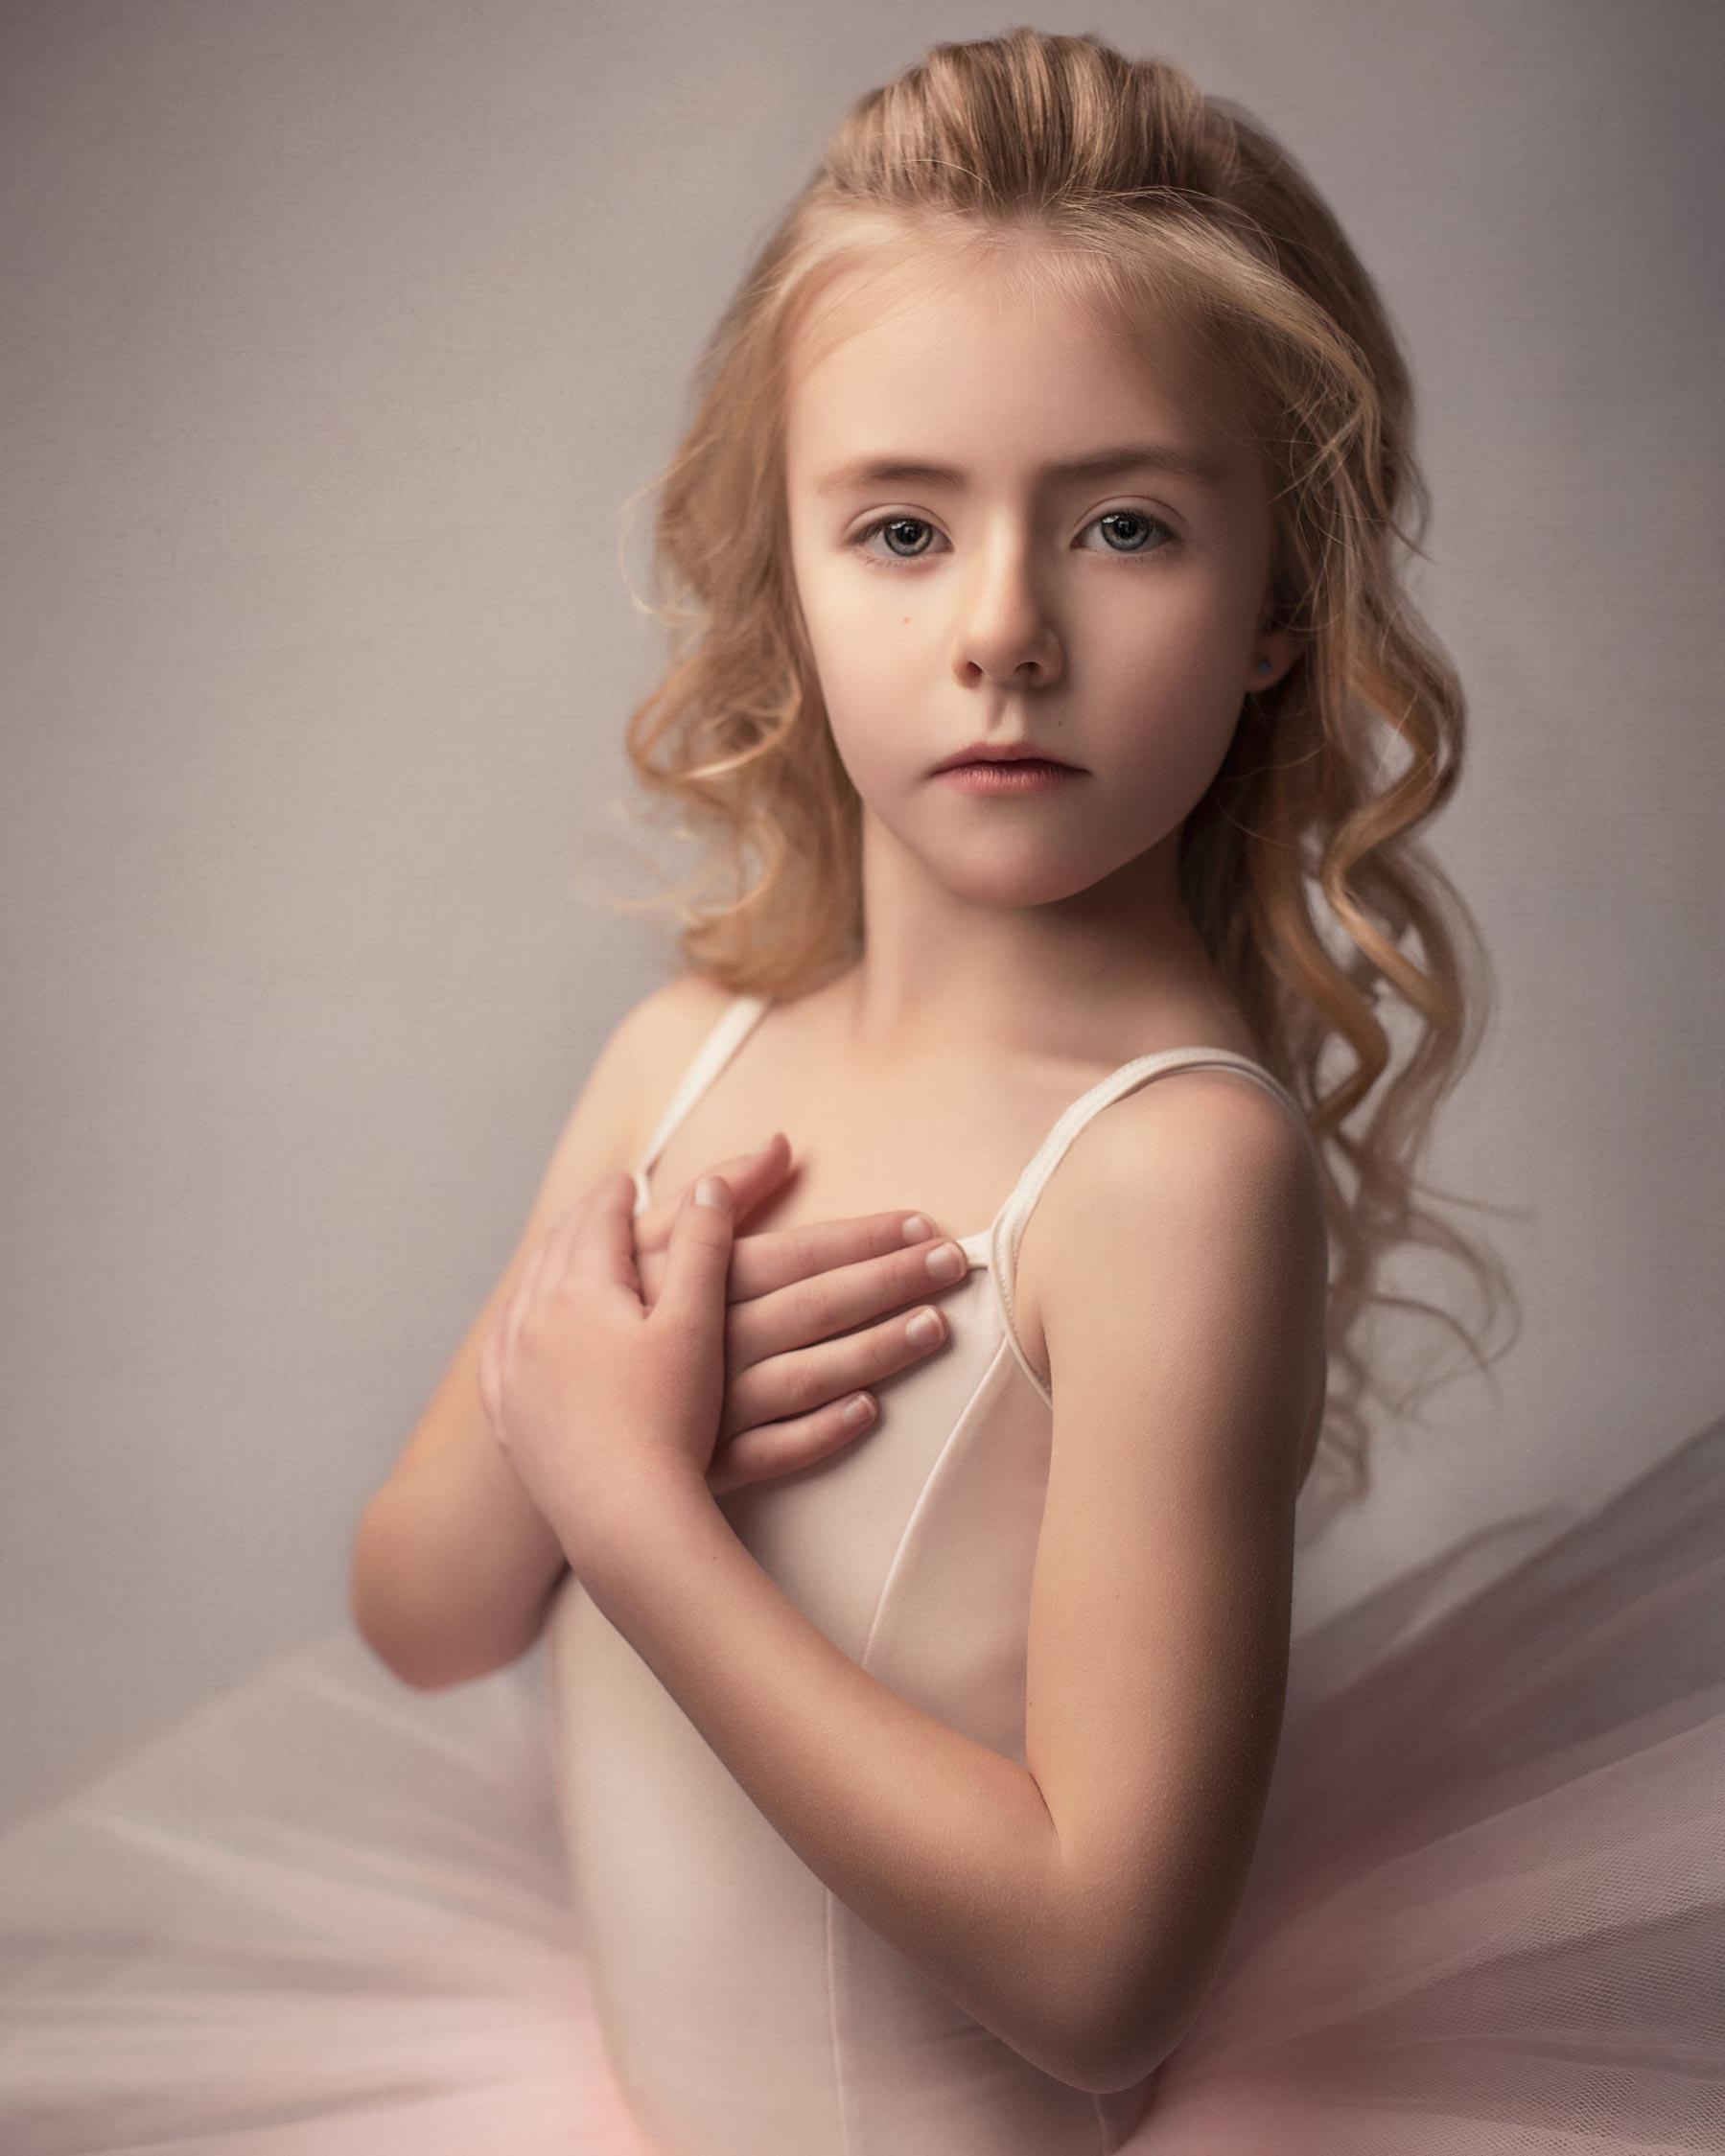 barbara_macferrin_photography_boulder_colorado_80303_fine_art_children_ballerina_girl_pink.jpg